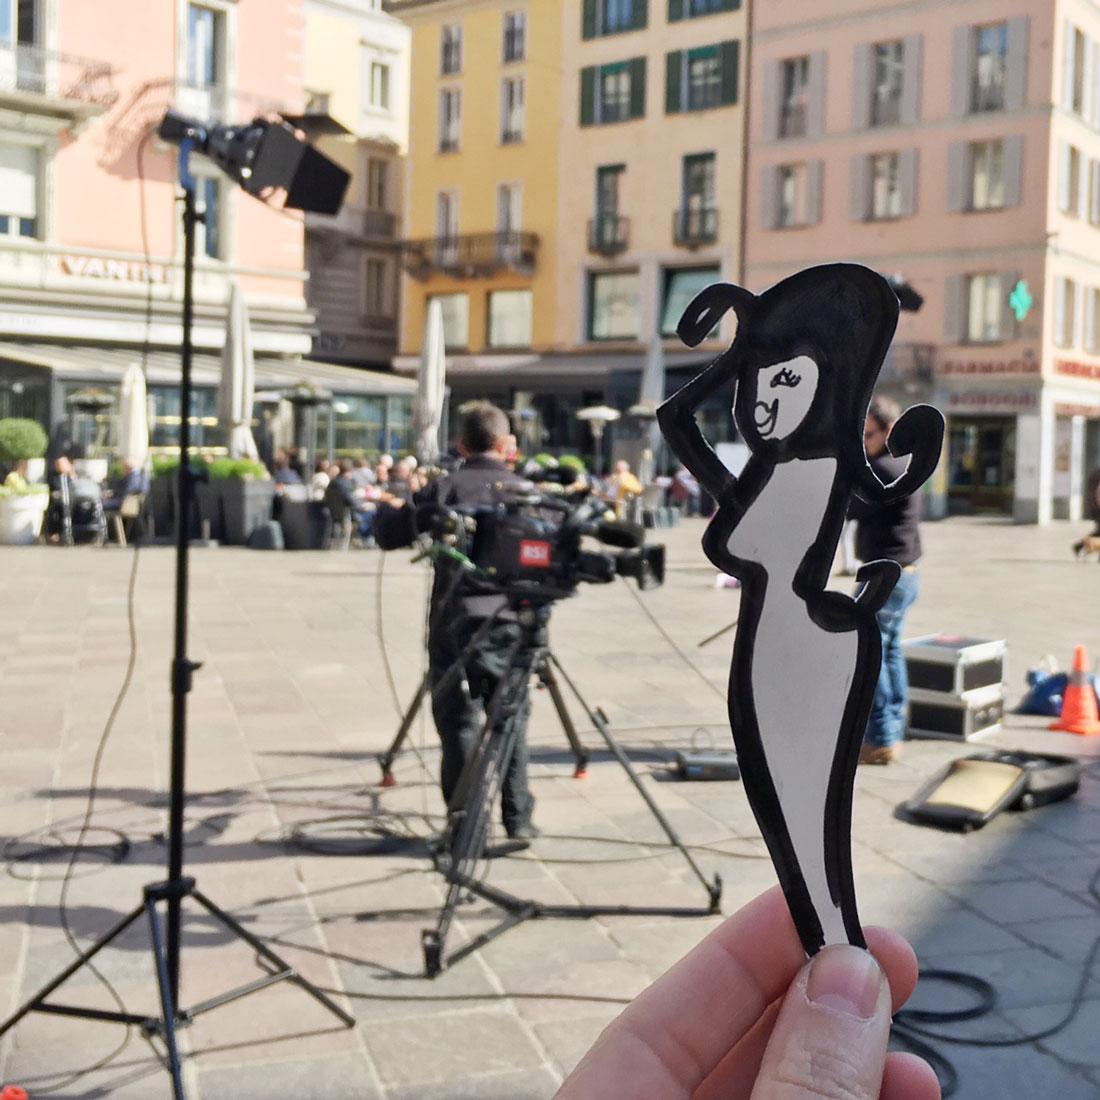 PiazzaRiformaW.jpg